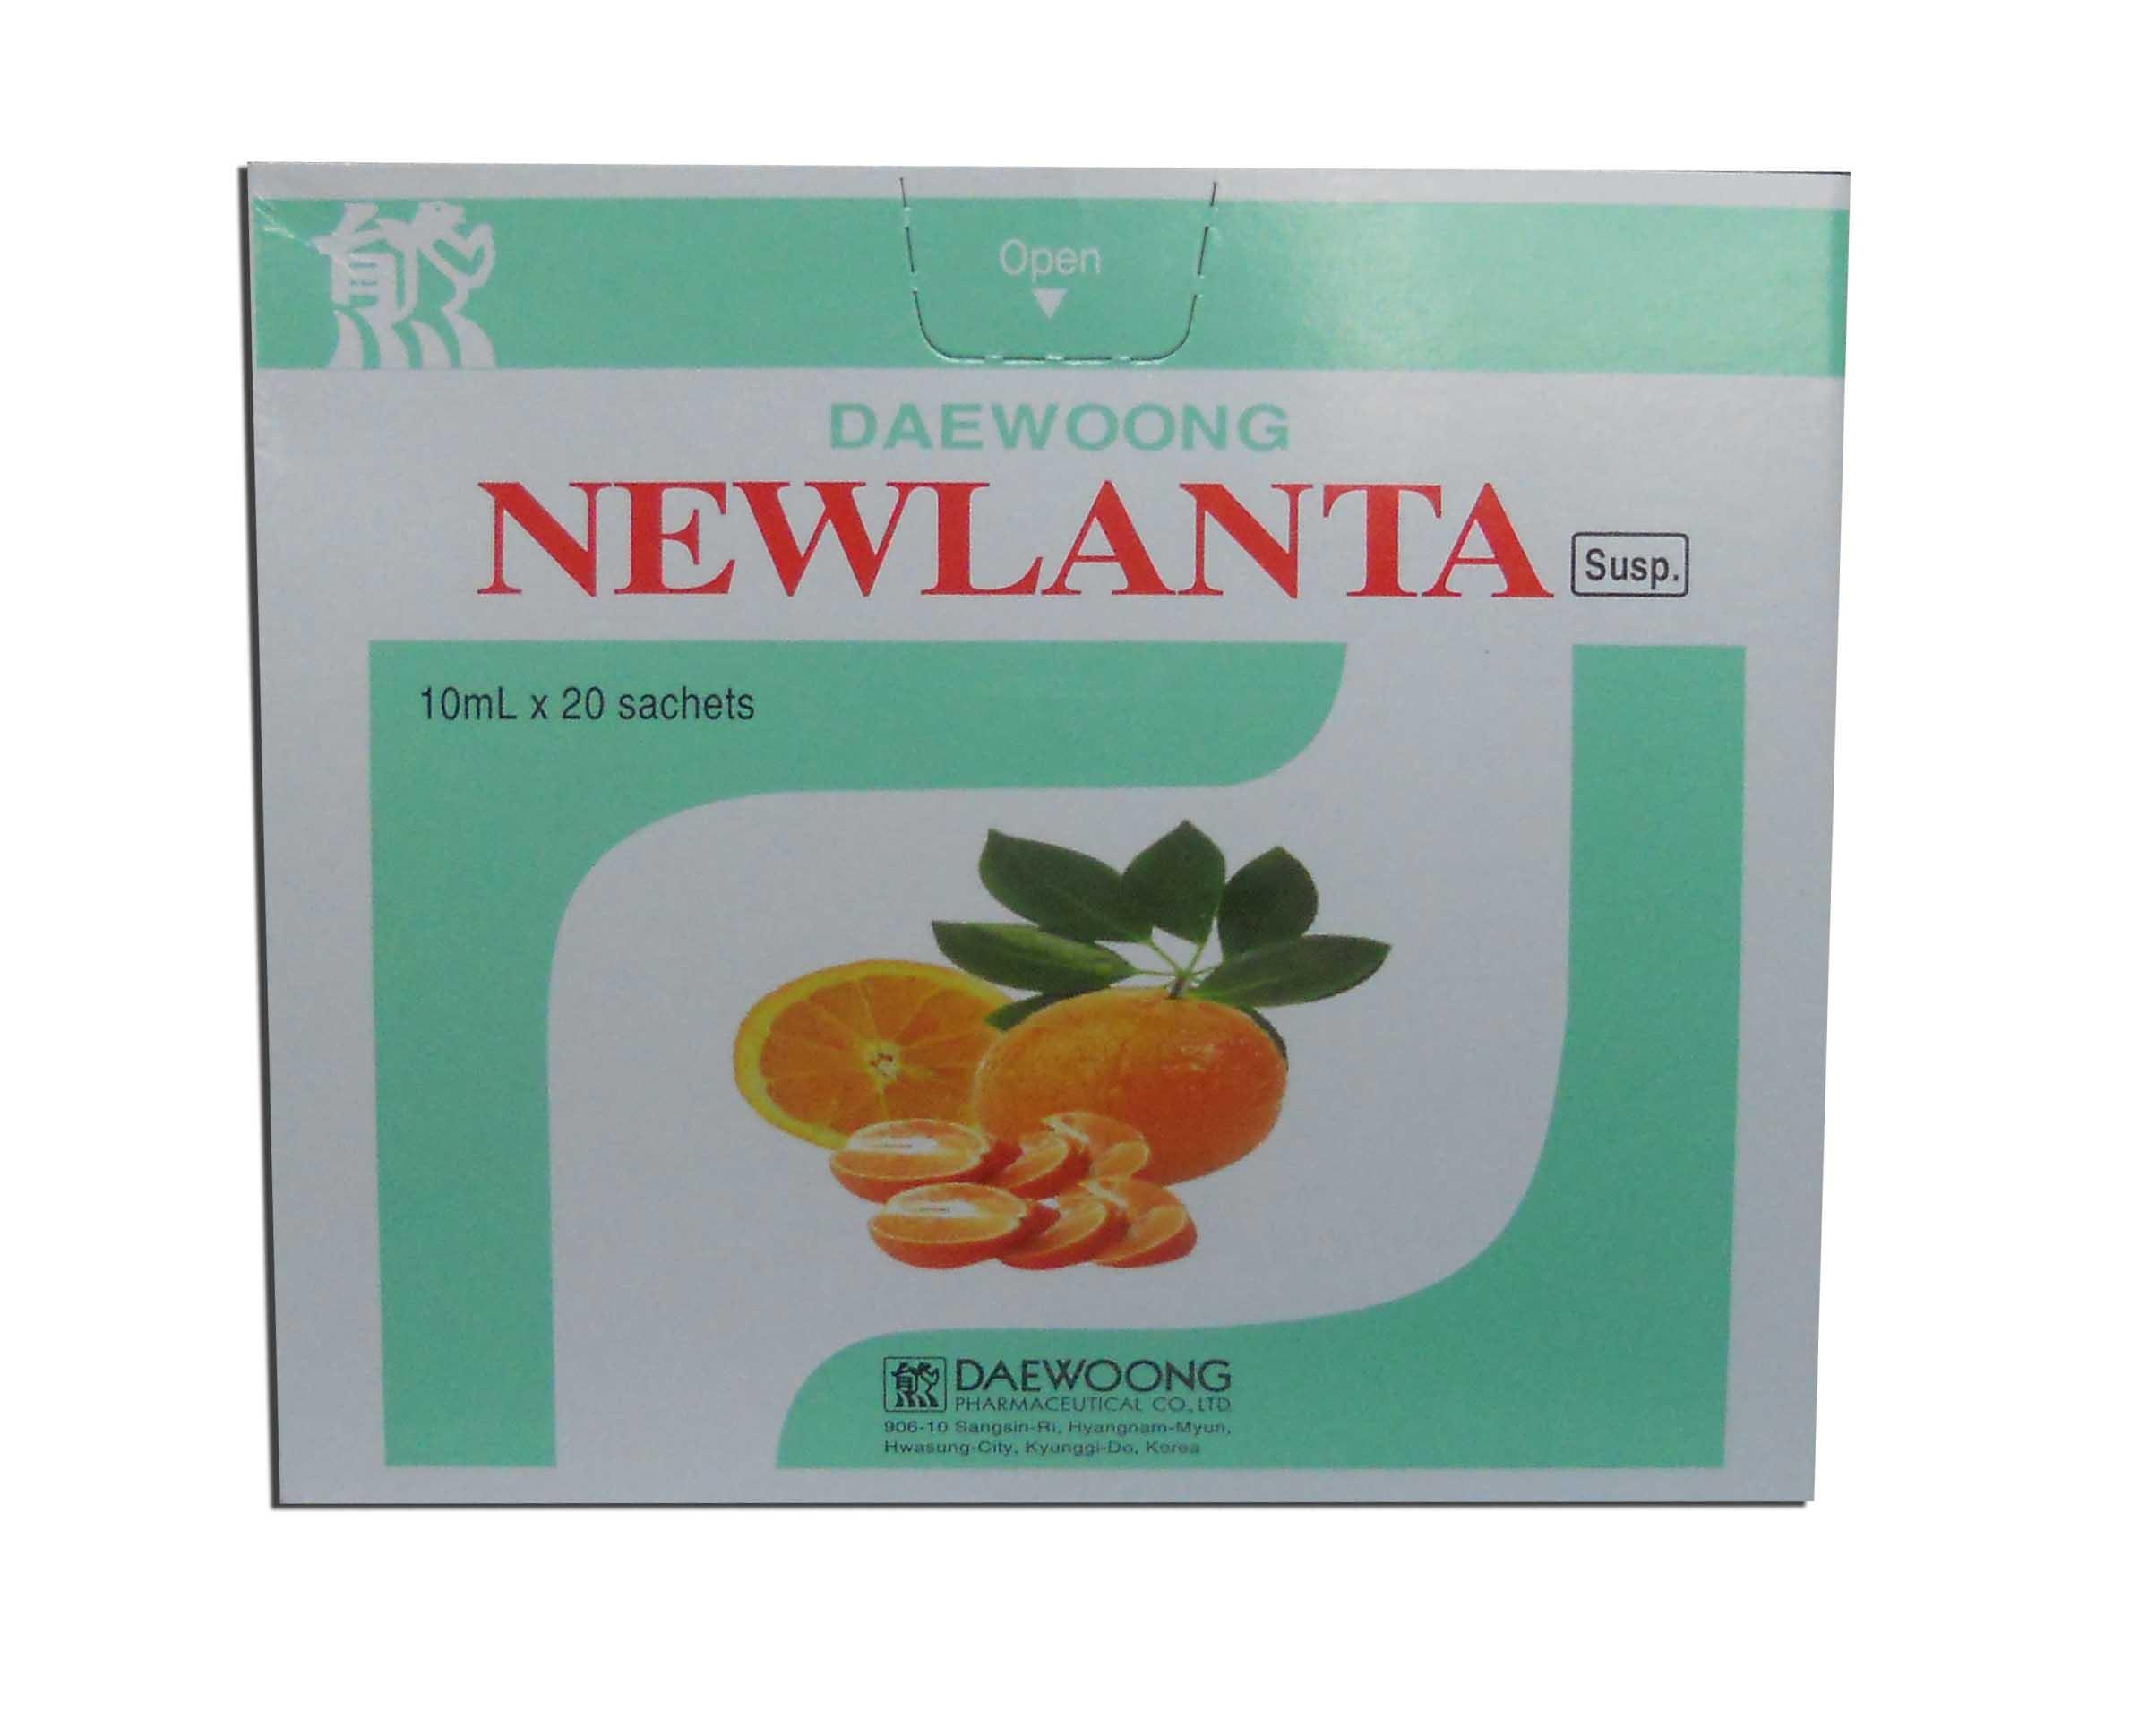 Newlanta